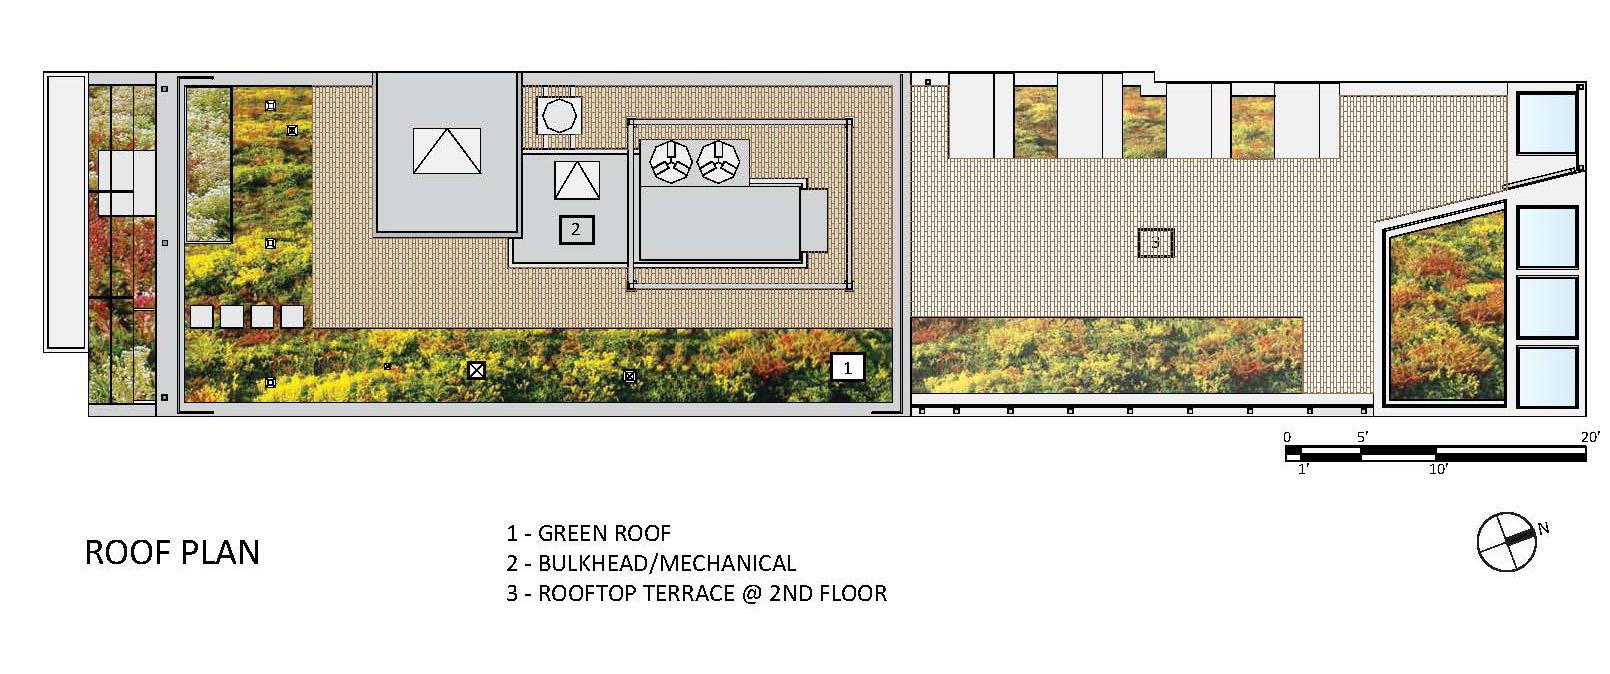 Roof_plan.jpg